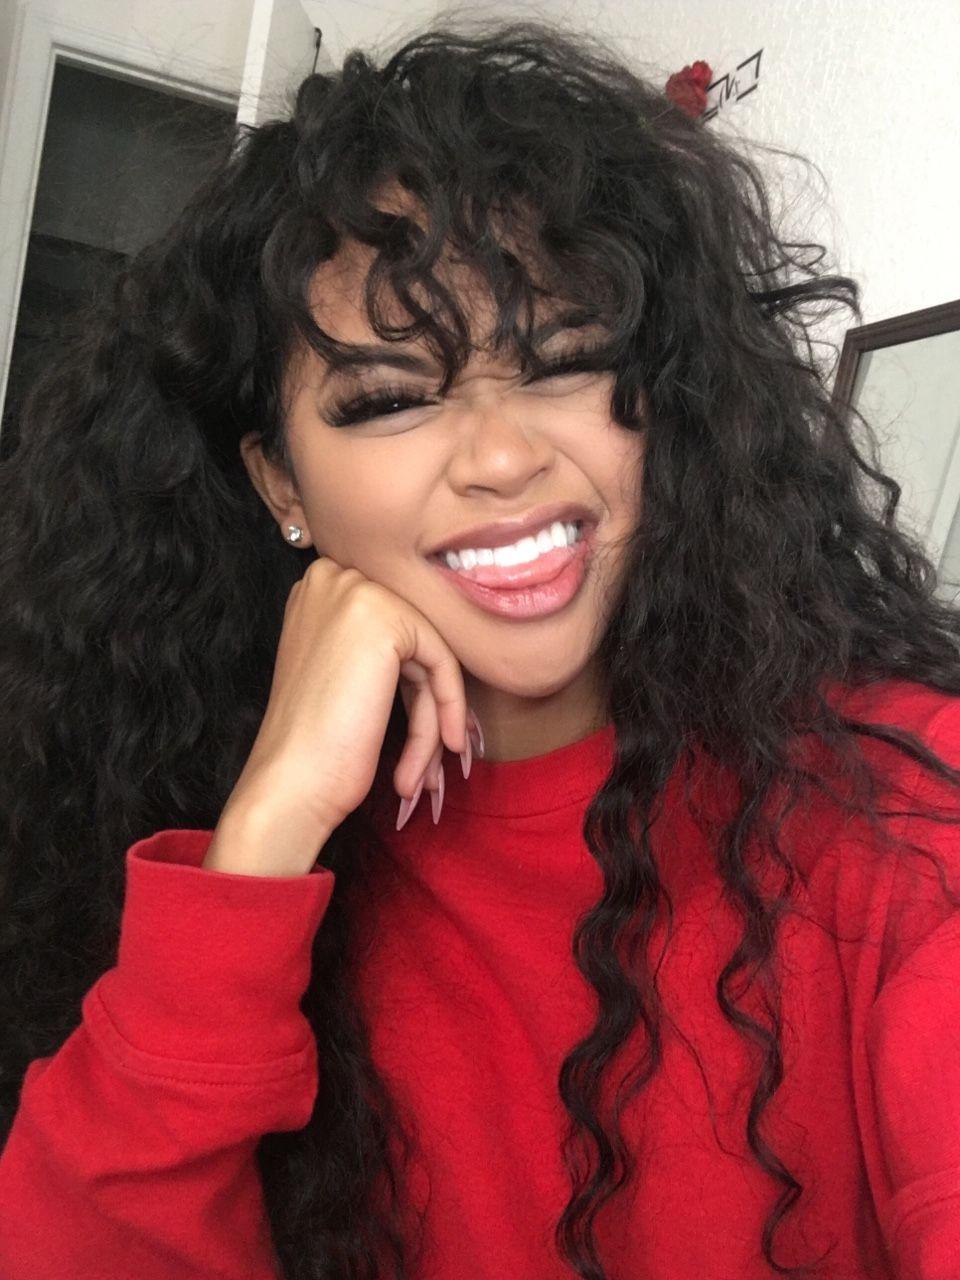 P I N T E R E S T K Negron Natural Hair And Curls All A Girl